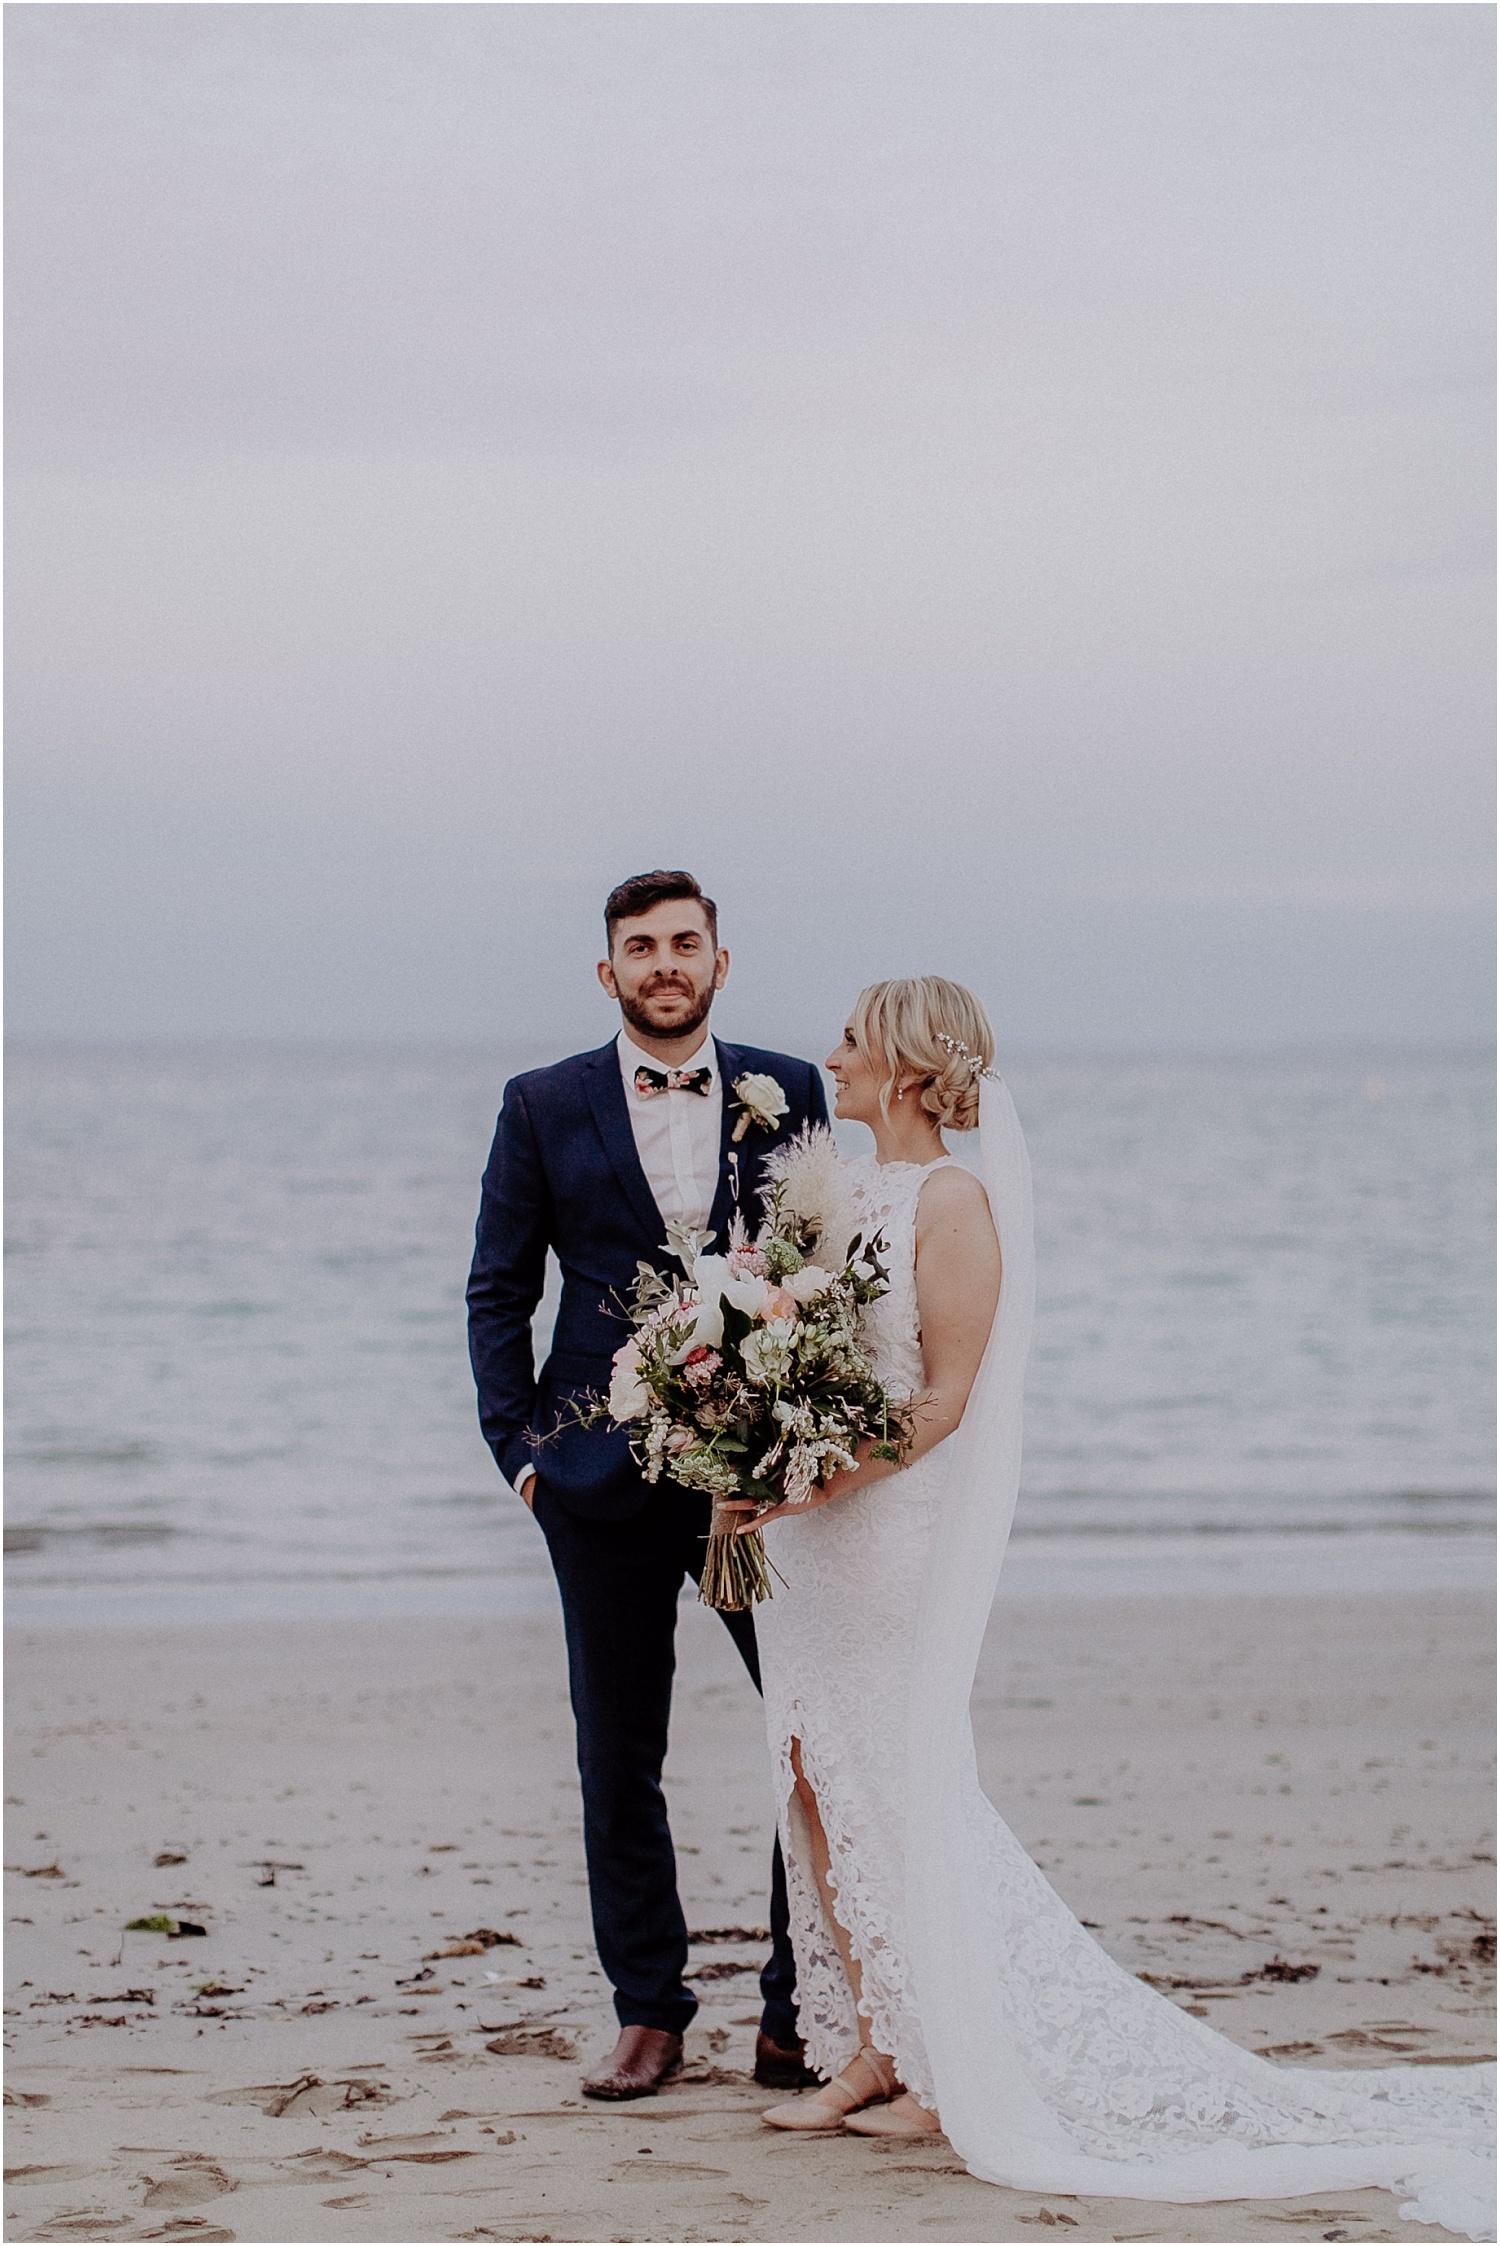 Nicolle and Damien's tipi wedding at the Flinders Yacht Club on the Mornington Peninsula._0202.jpg